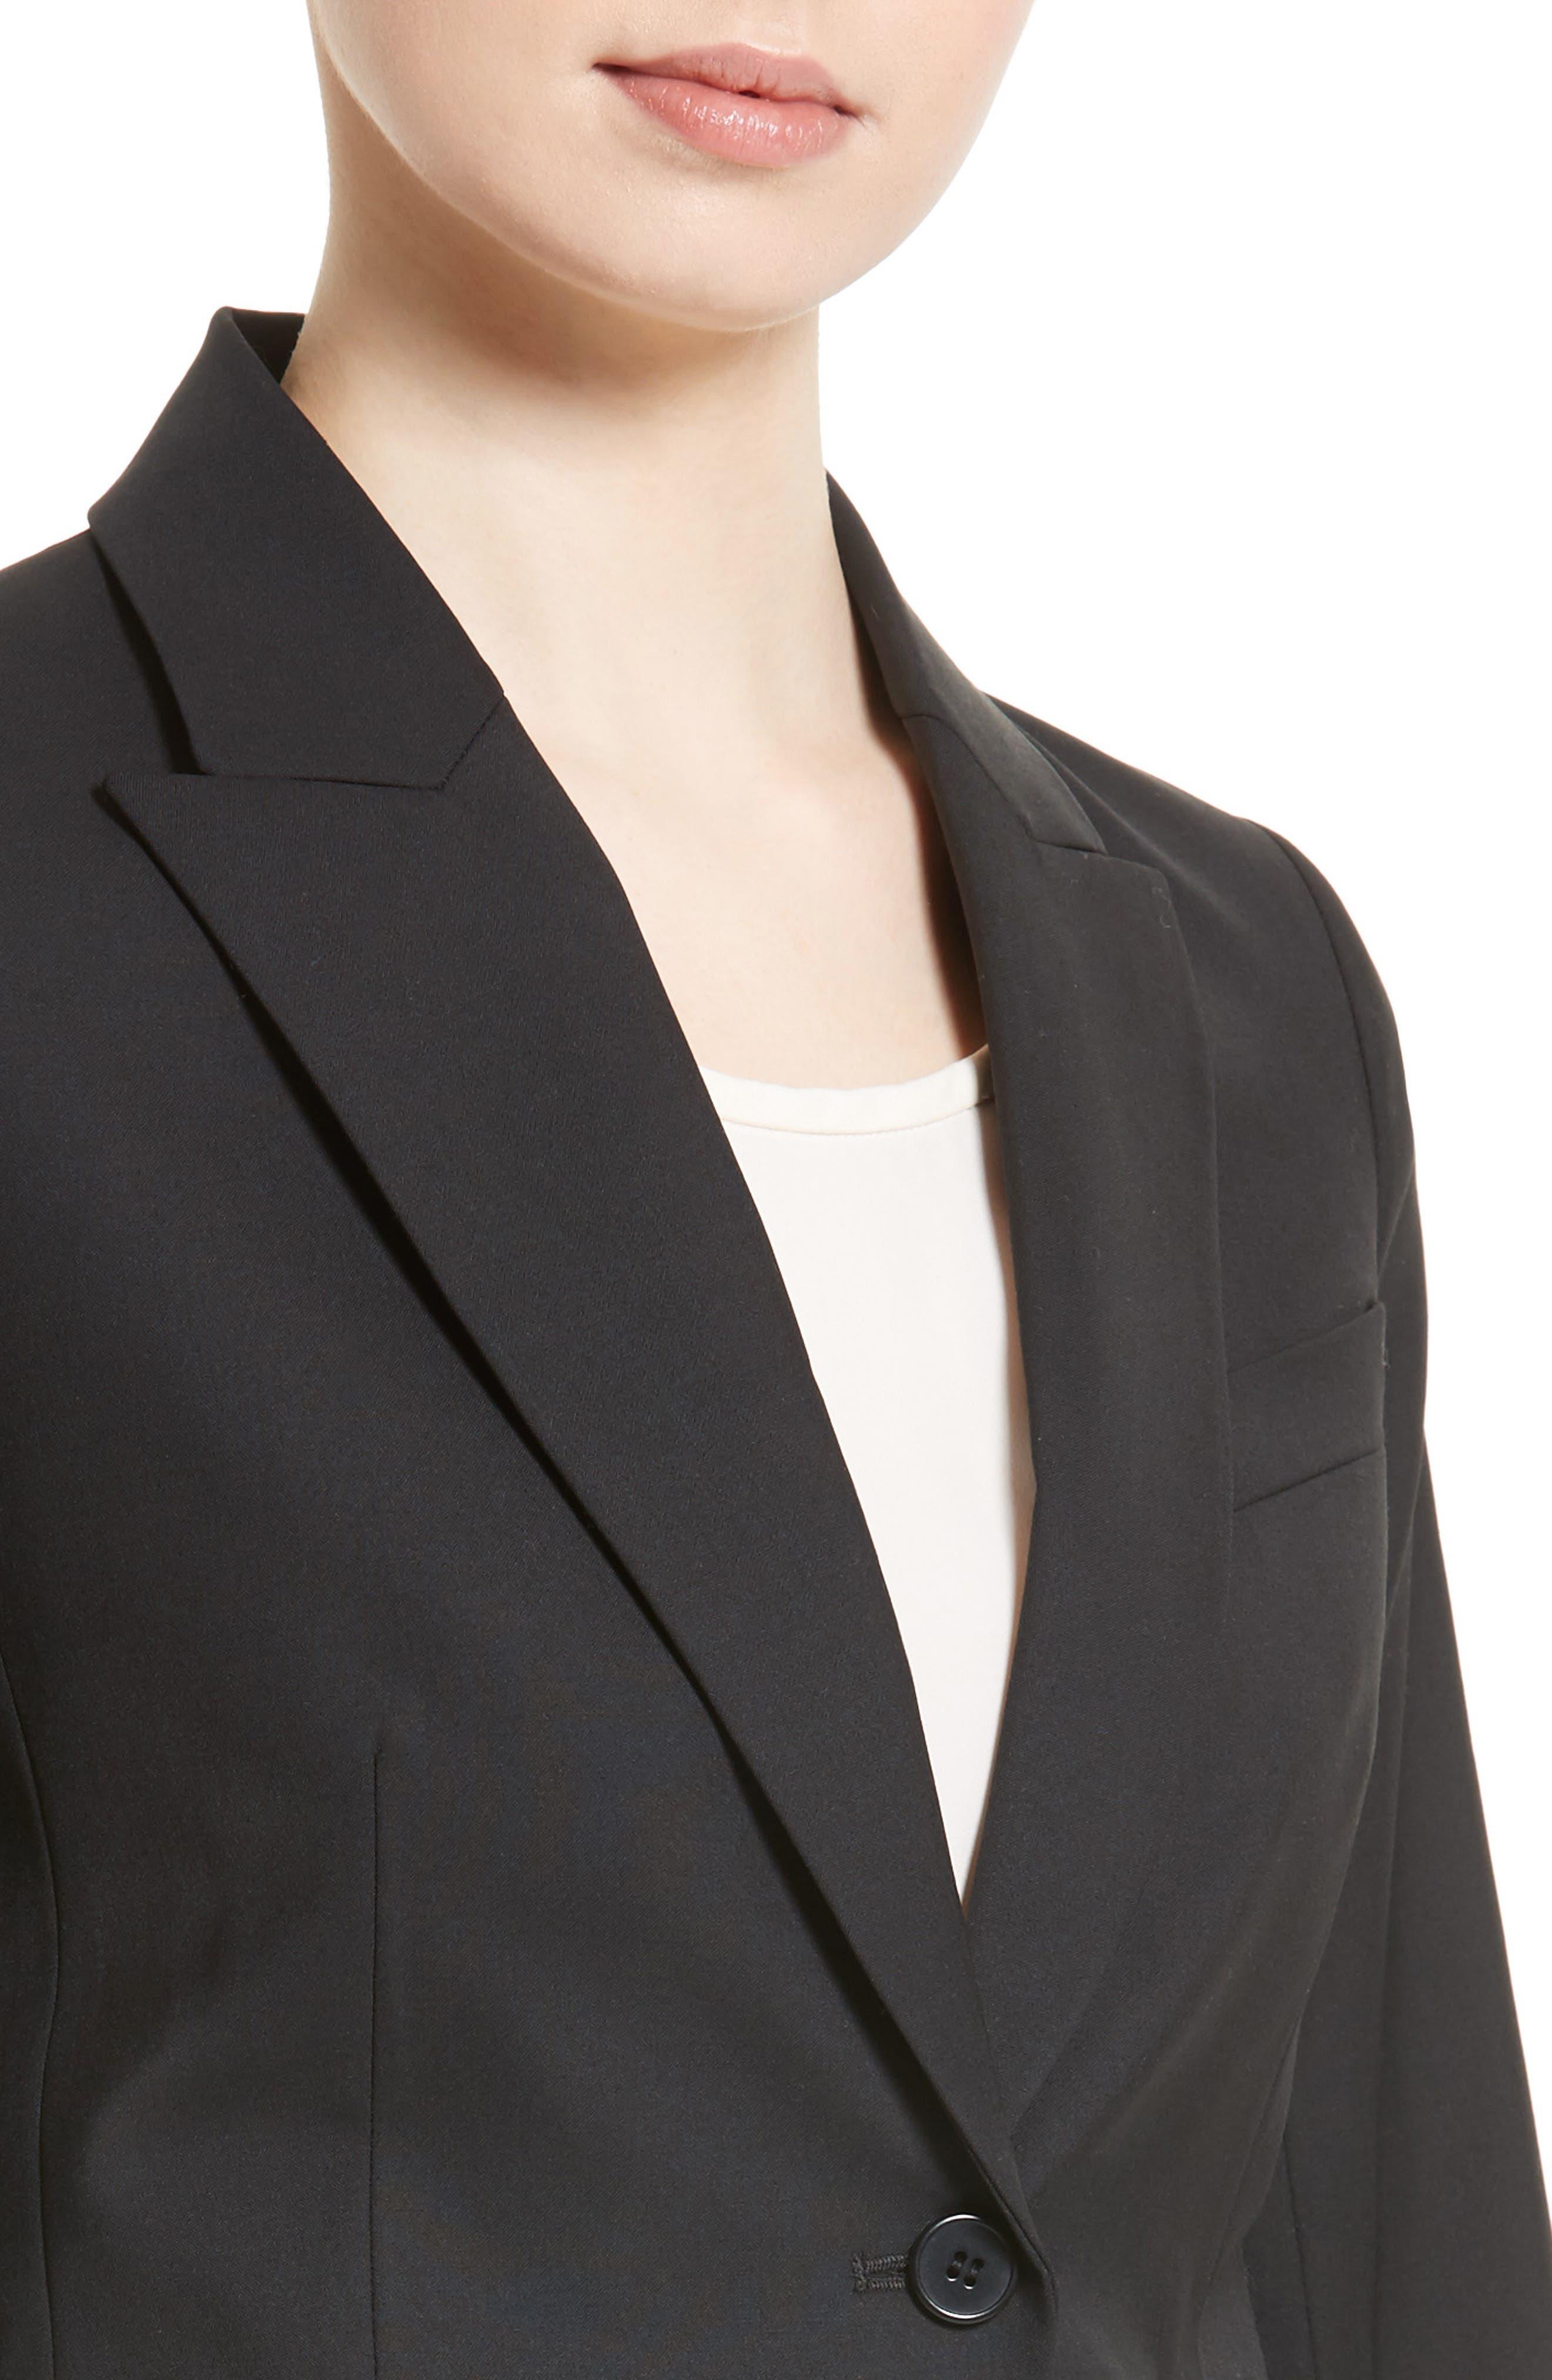 THEORY, Brince B Good Wool Suit Jacket, Alternate thumbnail 5, color, BLACK